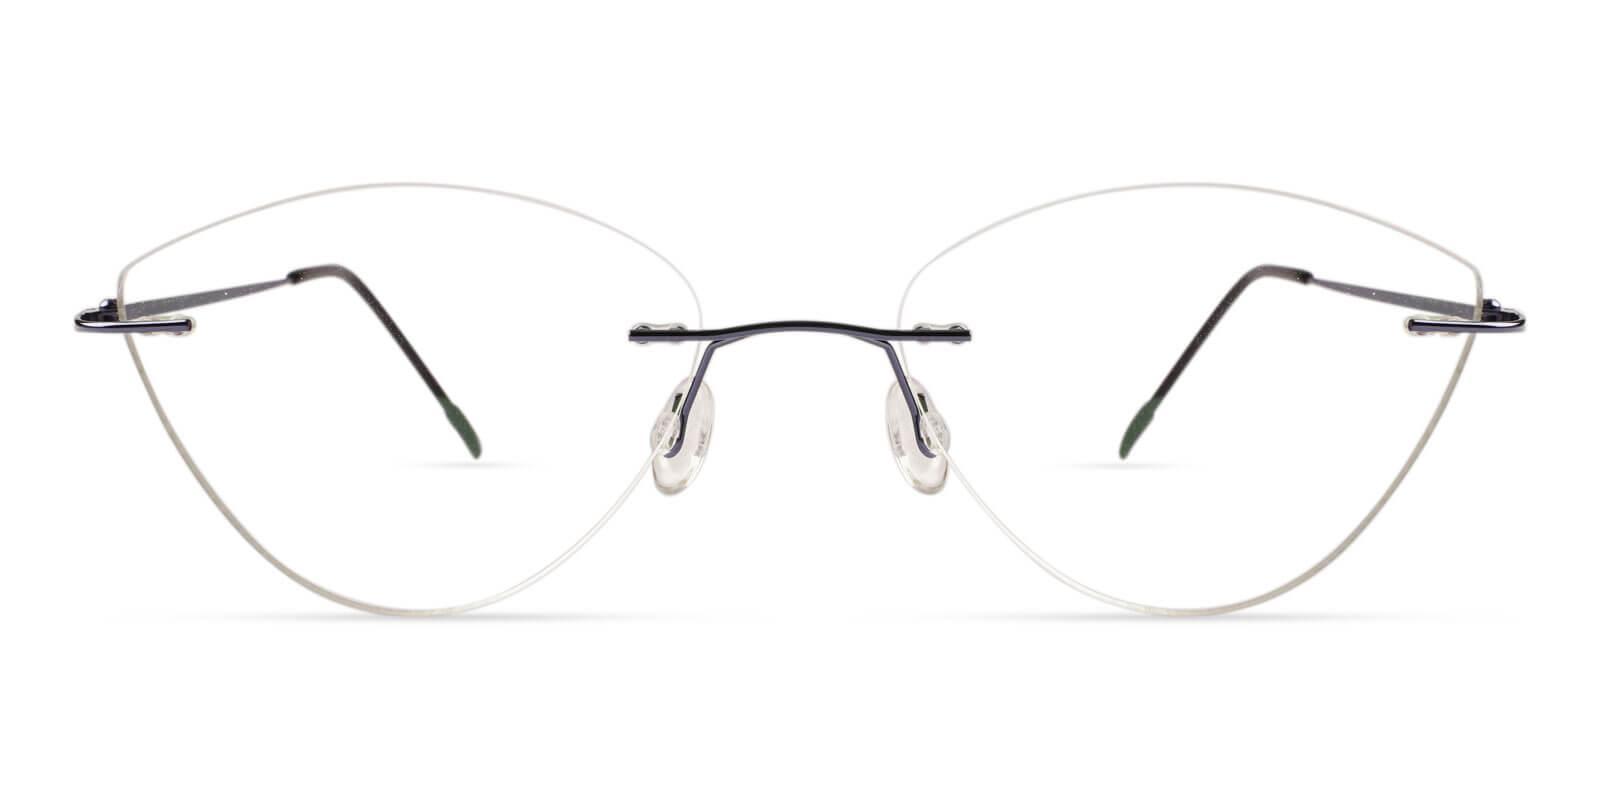 Huguenot Blue Metal Eyeglasses , NosePads Frames from ABBE Glasses